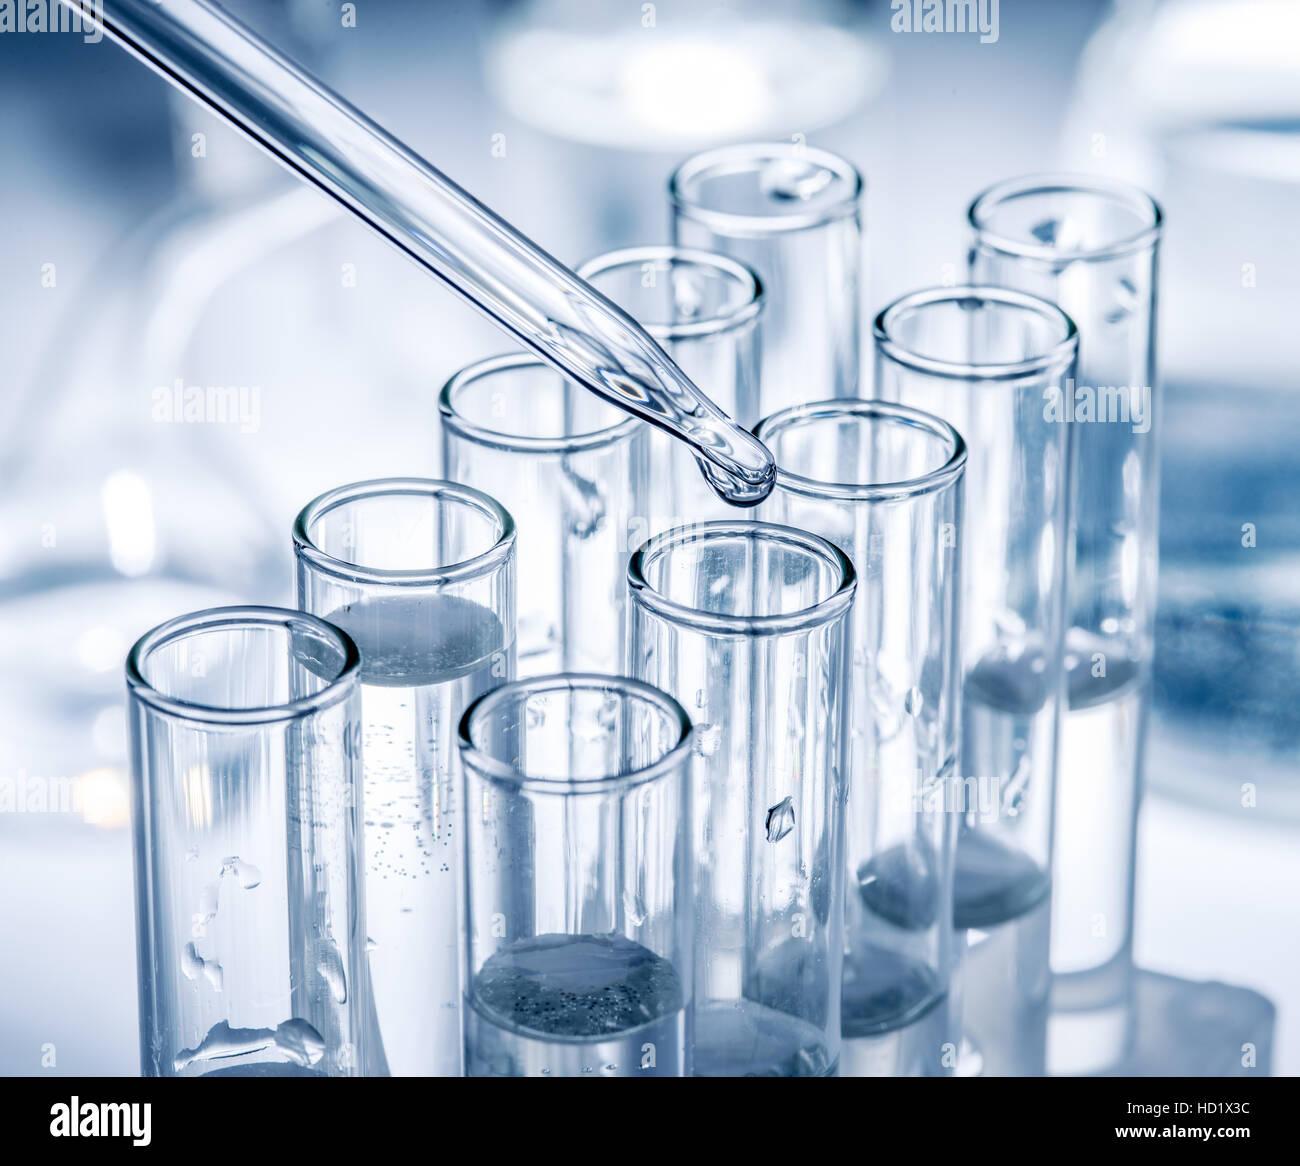 Different laboratory beakers and glassware. Monochrome. Stock Photo